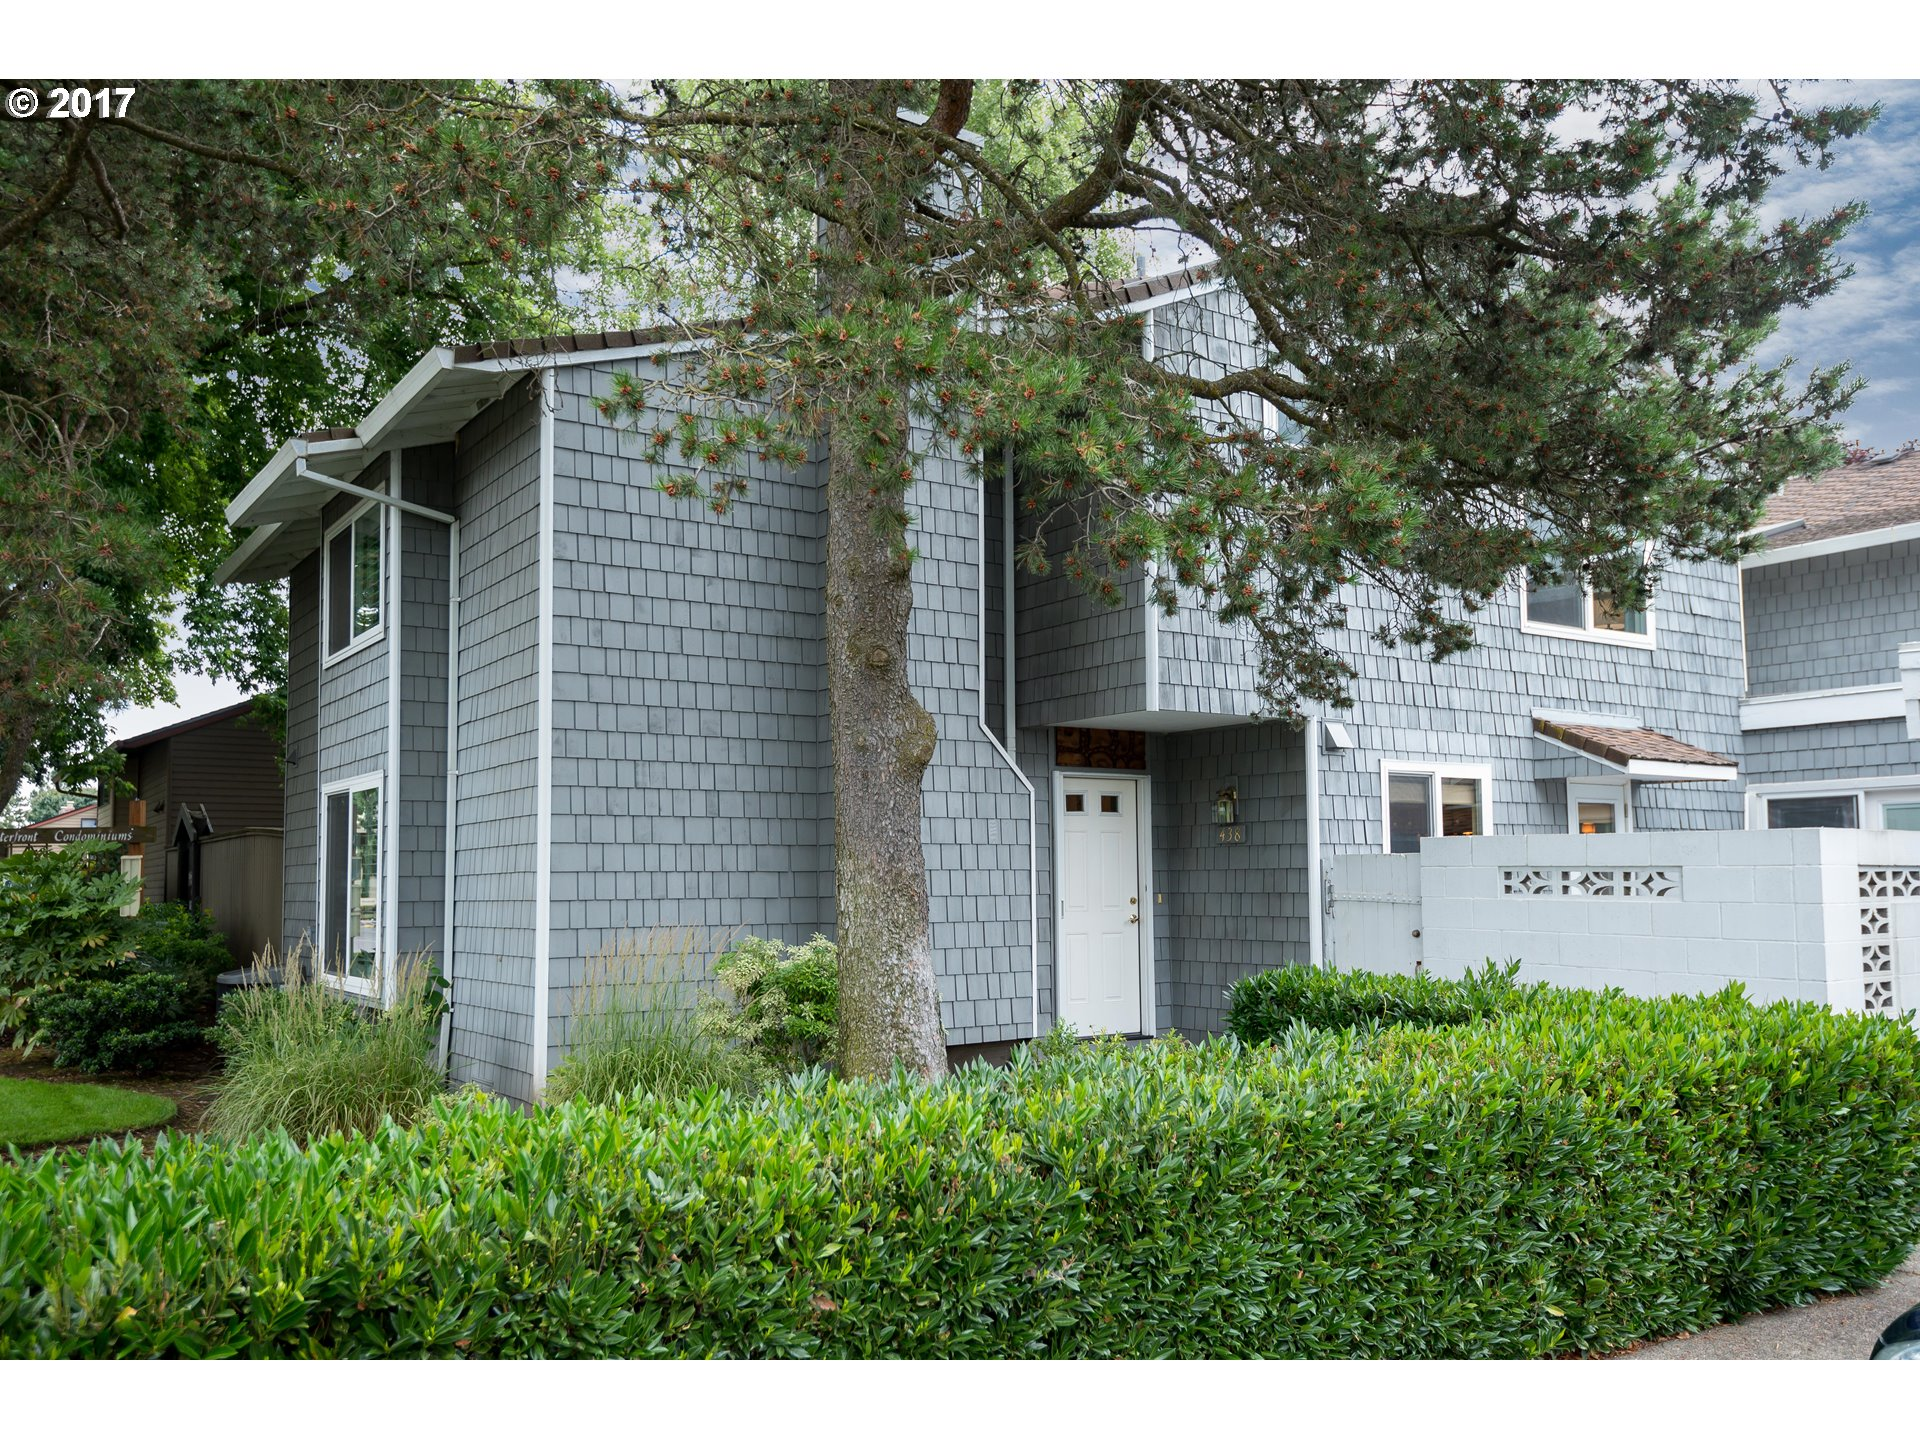 438 N HAYDEN BAY DR, Portland, OR 97217